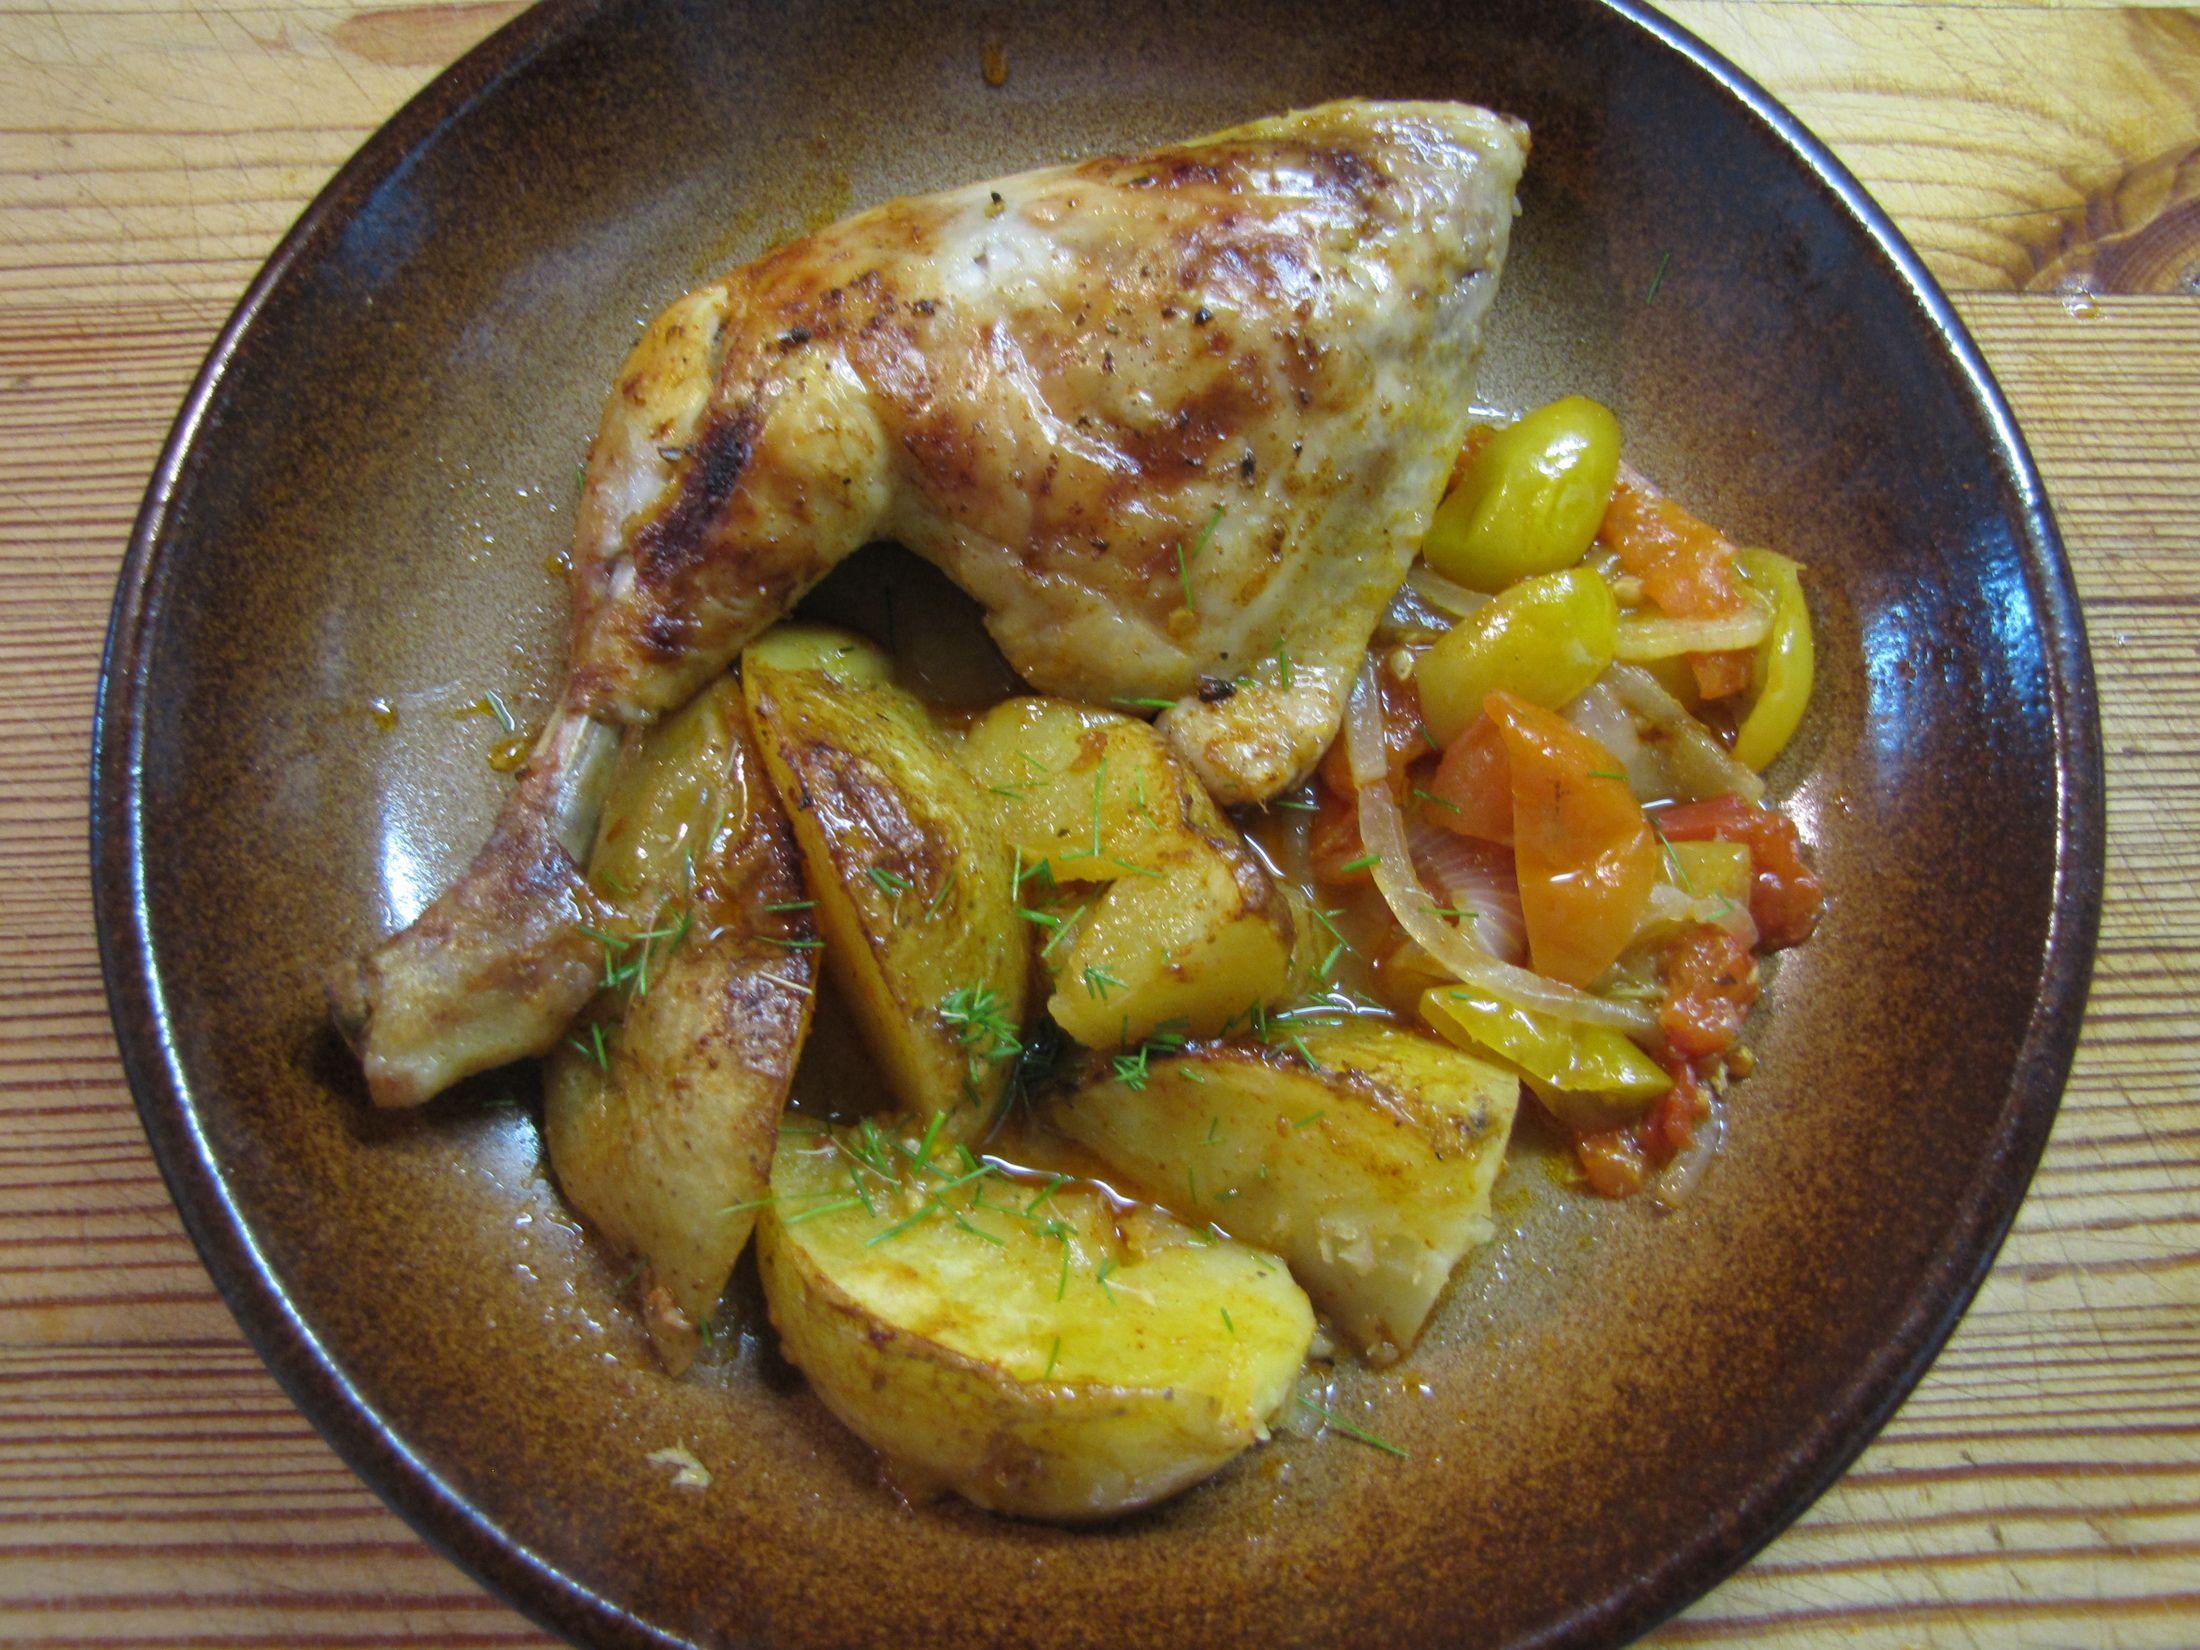 Kuře pečené s brambory a rajčaty